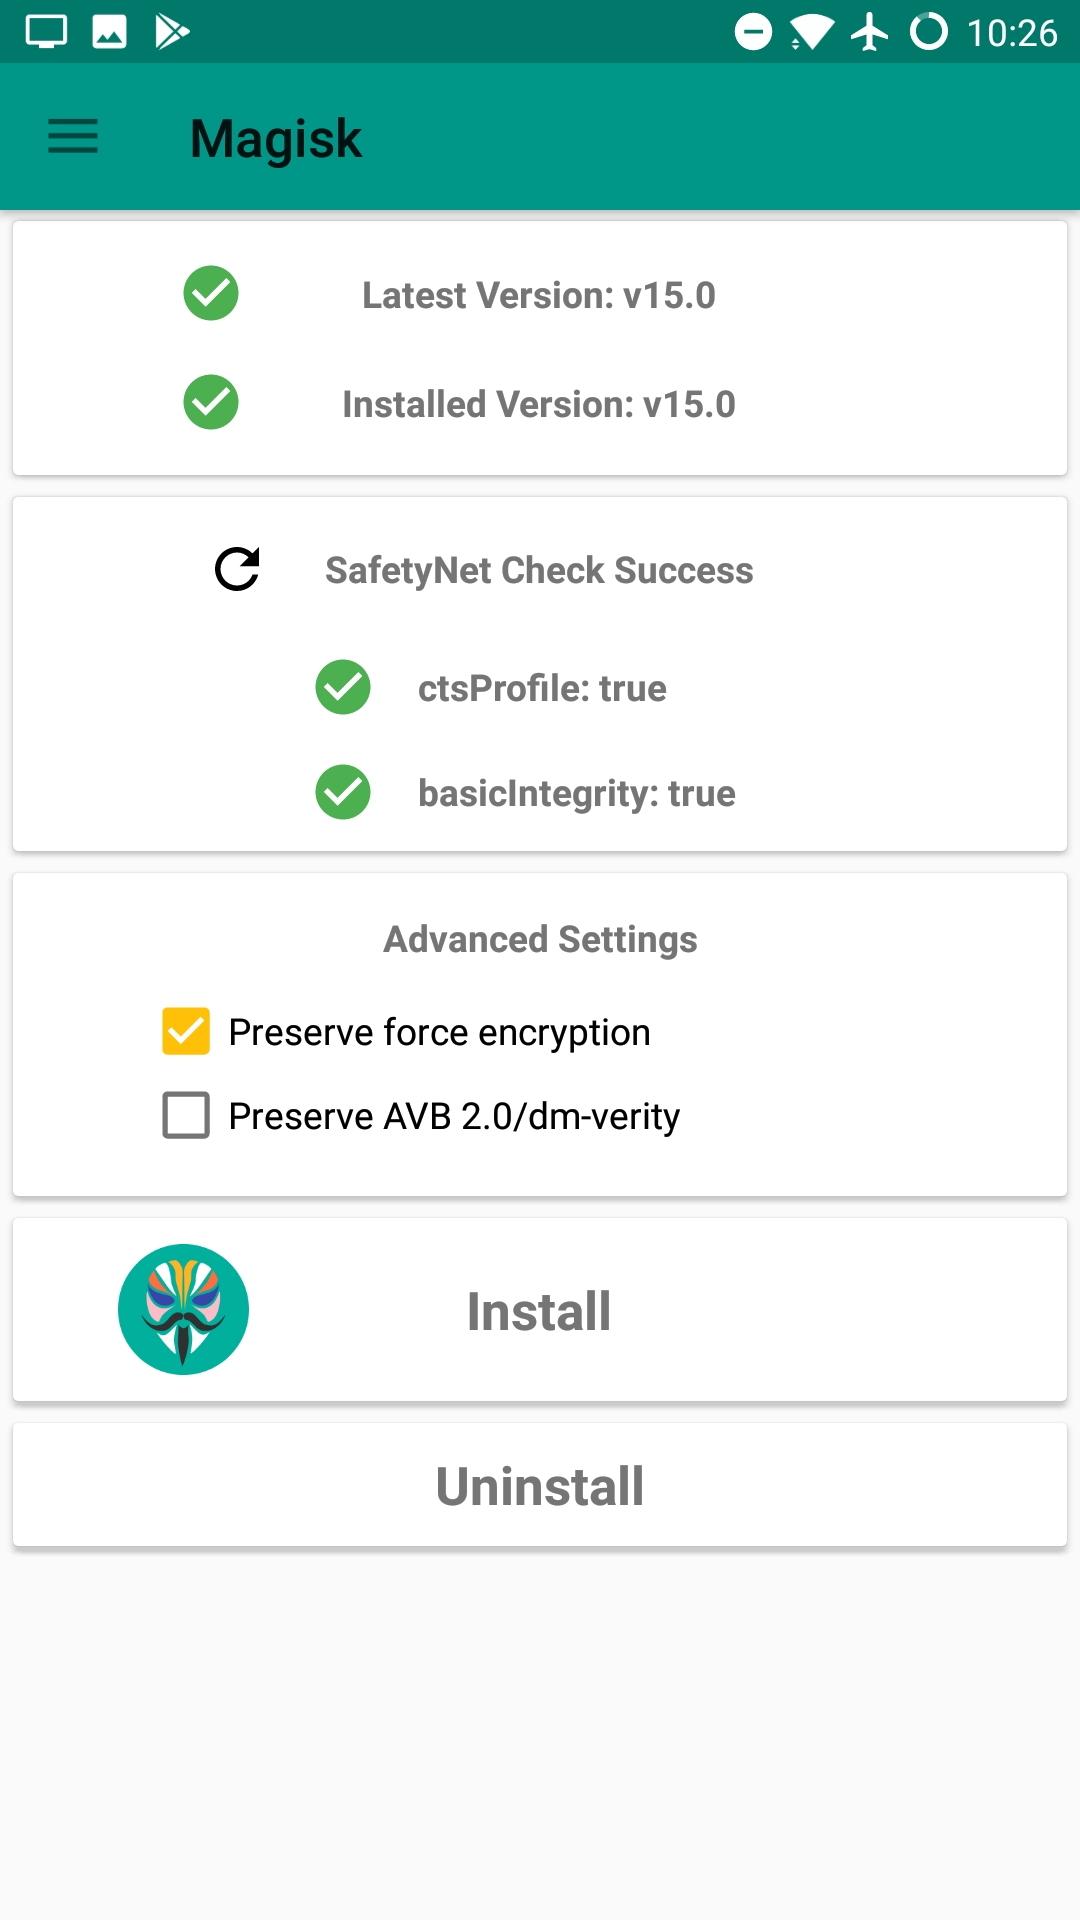 Magisk v15 1 released to stable, fixes v15 bootloop for some